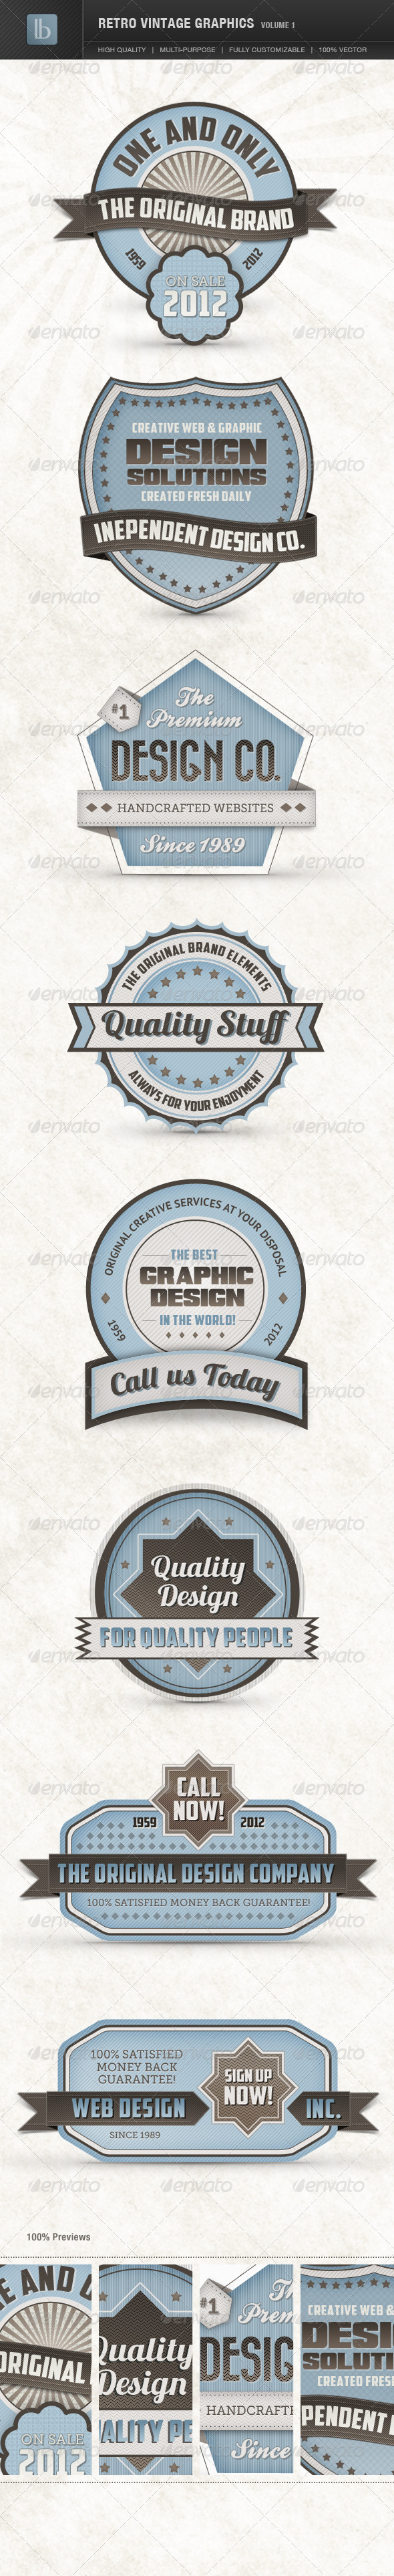 GraphicRiver Retro Vintage Graphics Volume 1 1312677